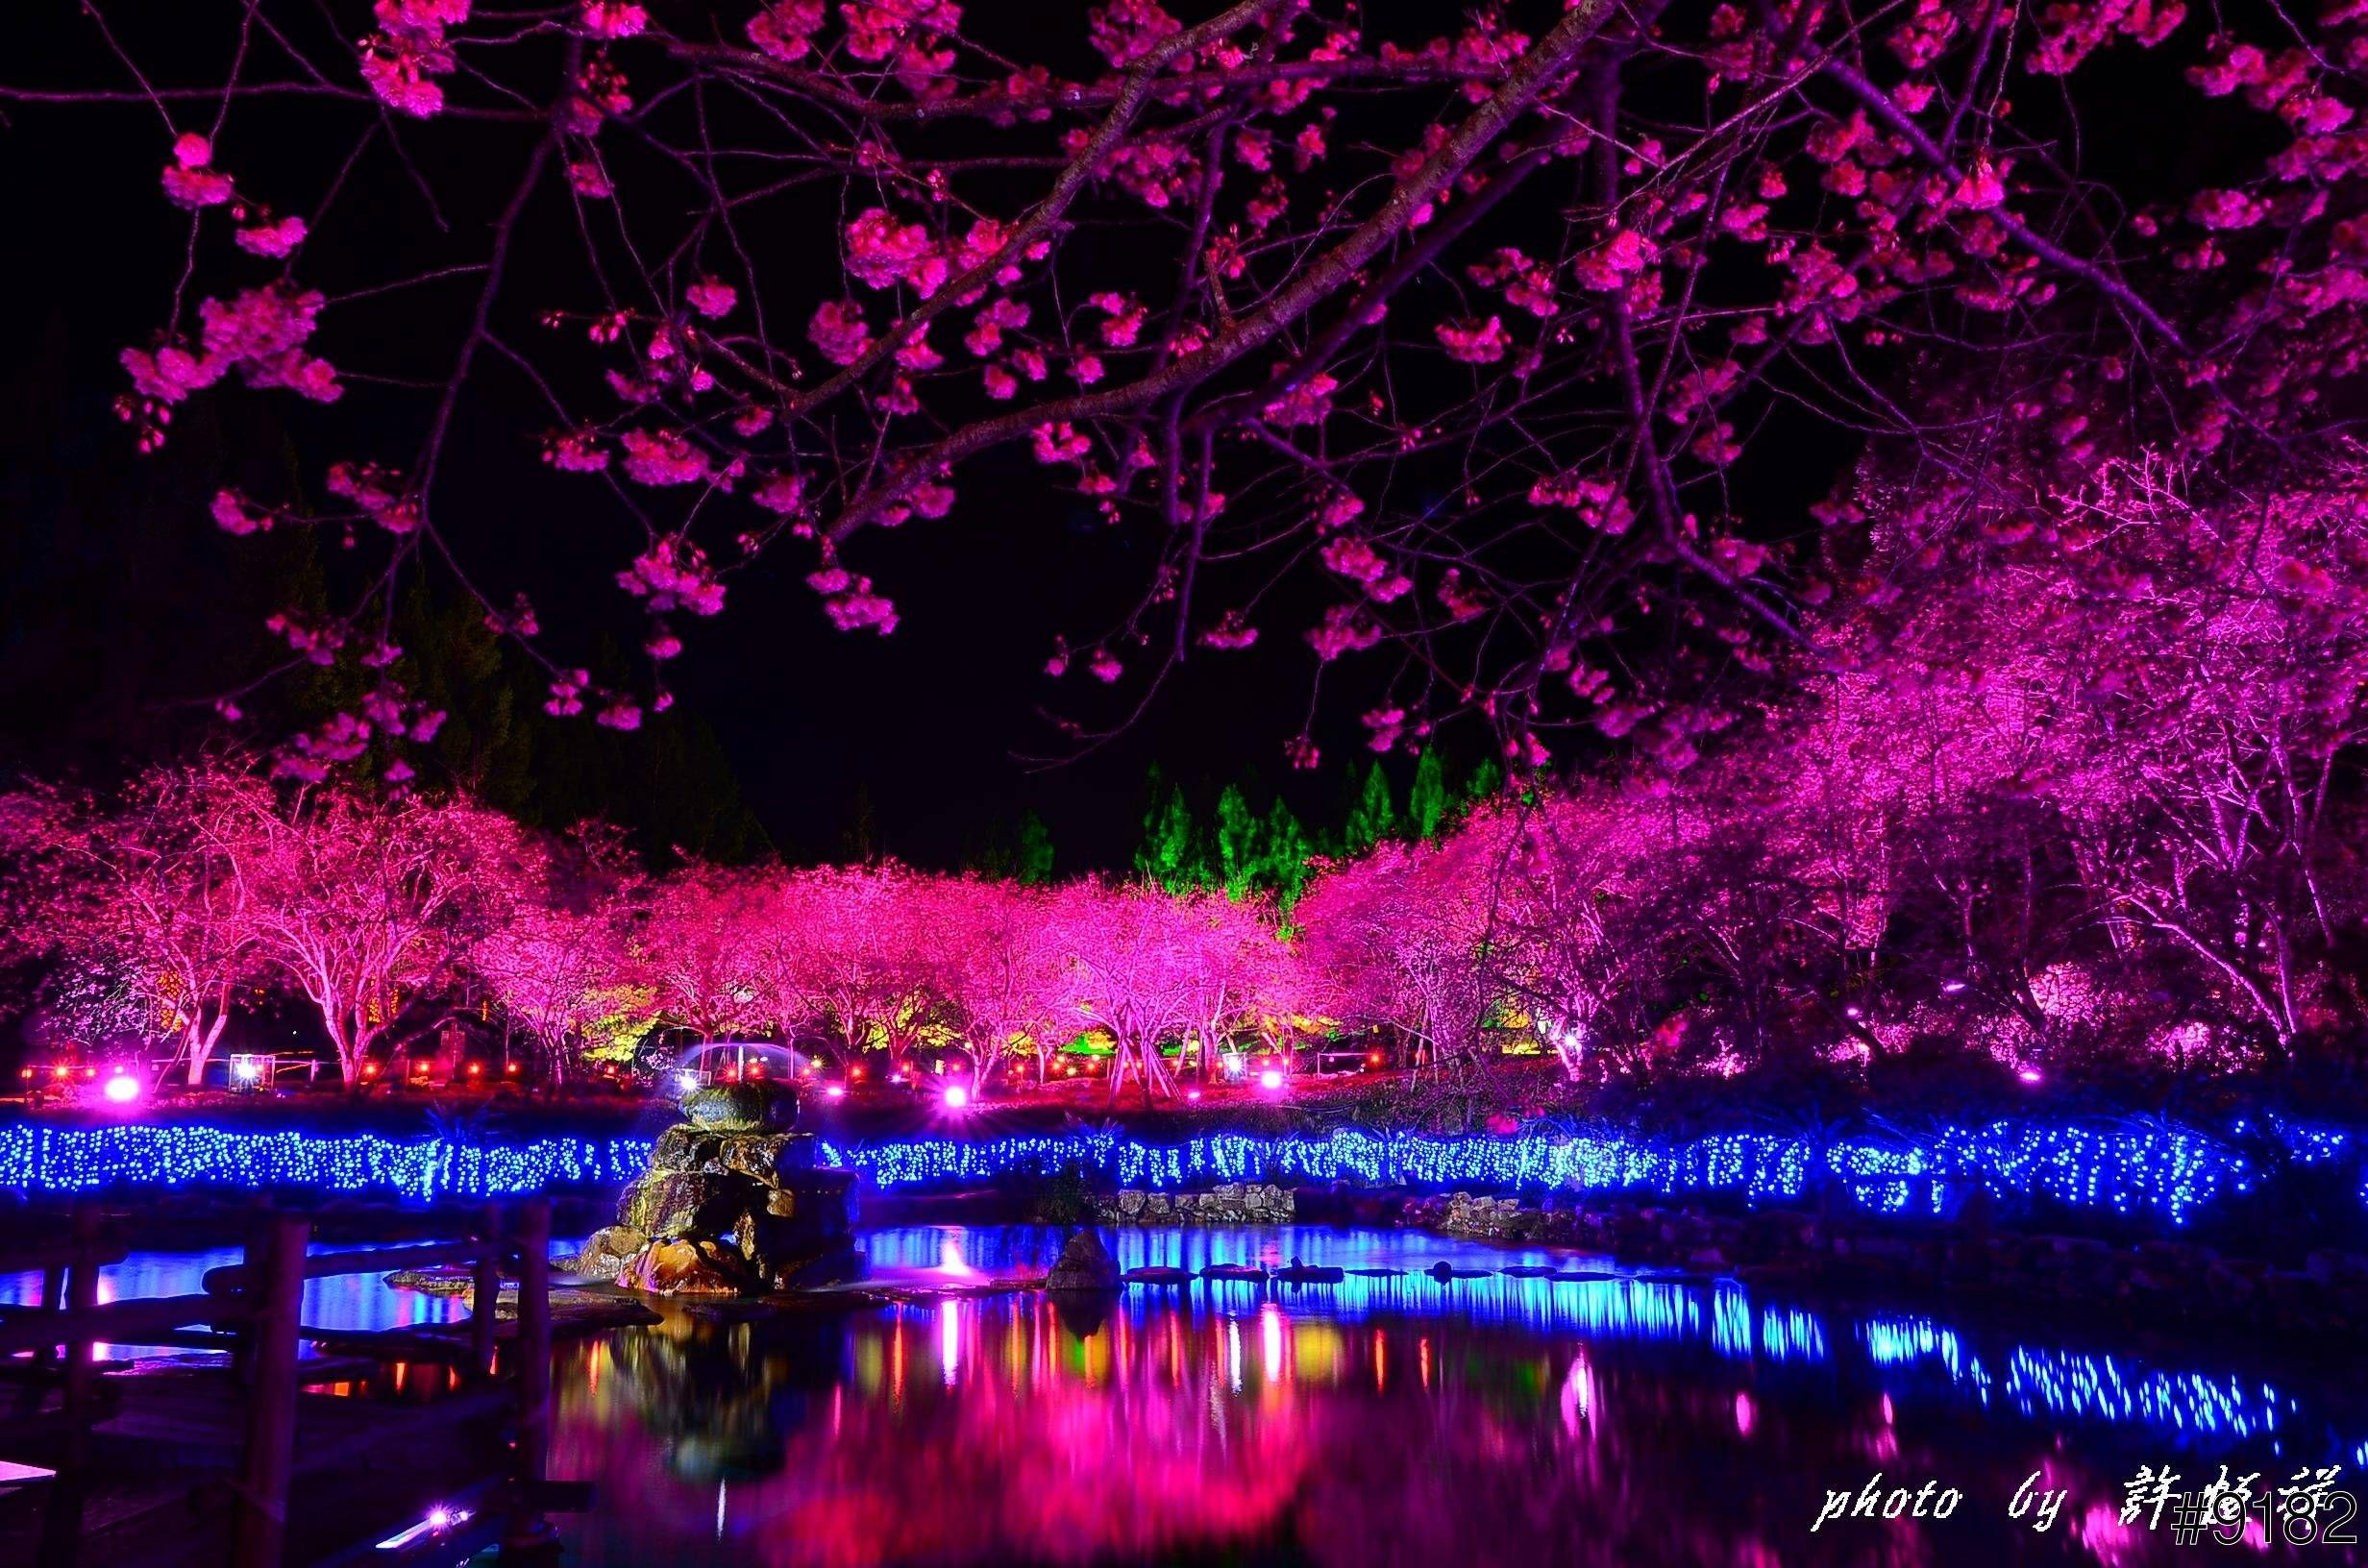 Cherry Blossom Lake Google Search Sakura Cherry Blossom Japanese Cherry Blossom Flower Garden Images